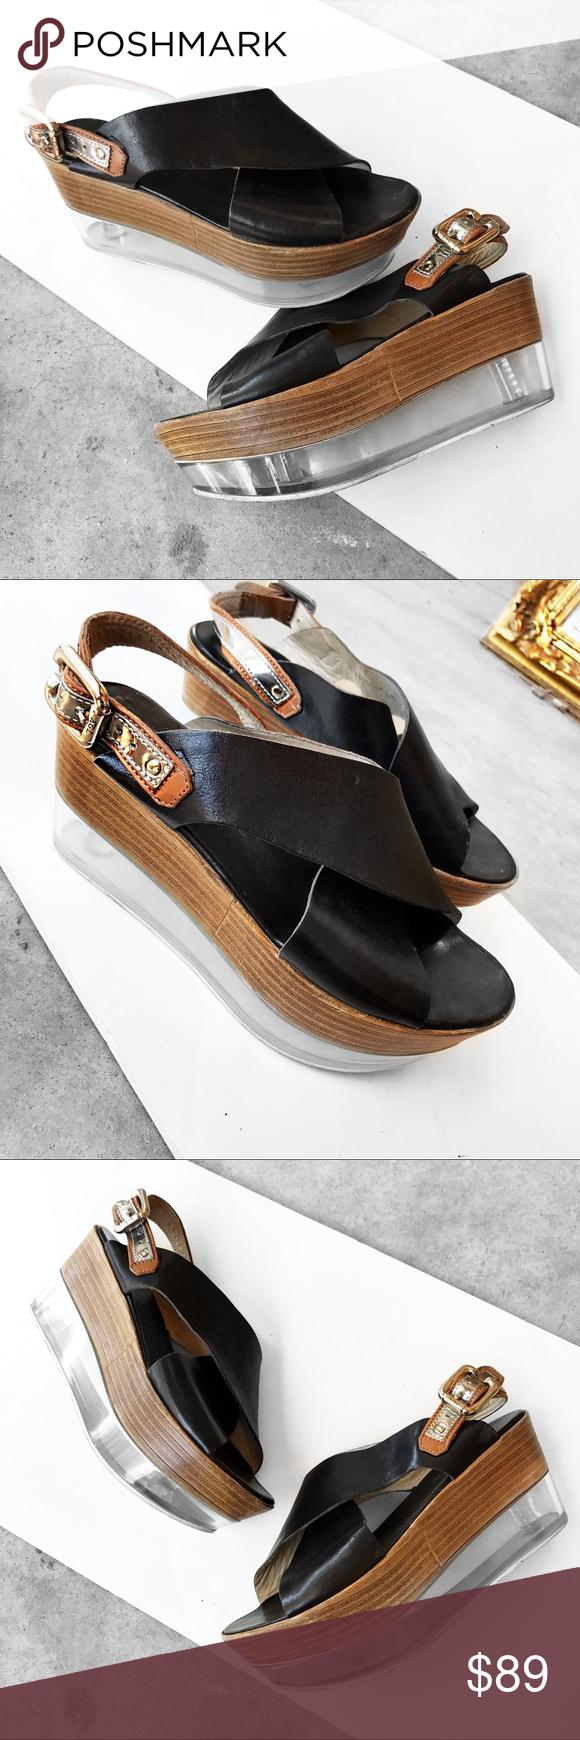 AGL flat form sandals   Black leather flats, Black leather